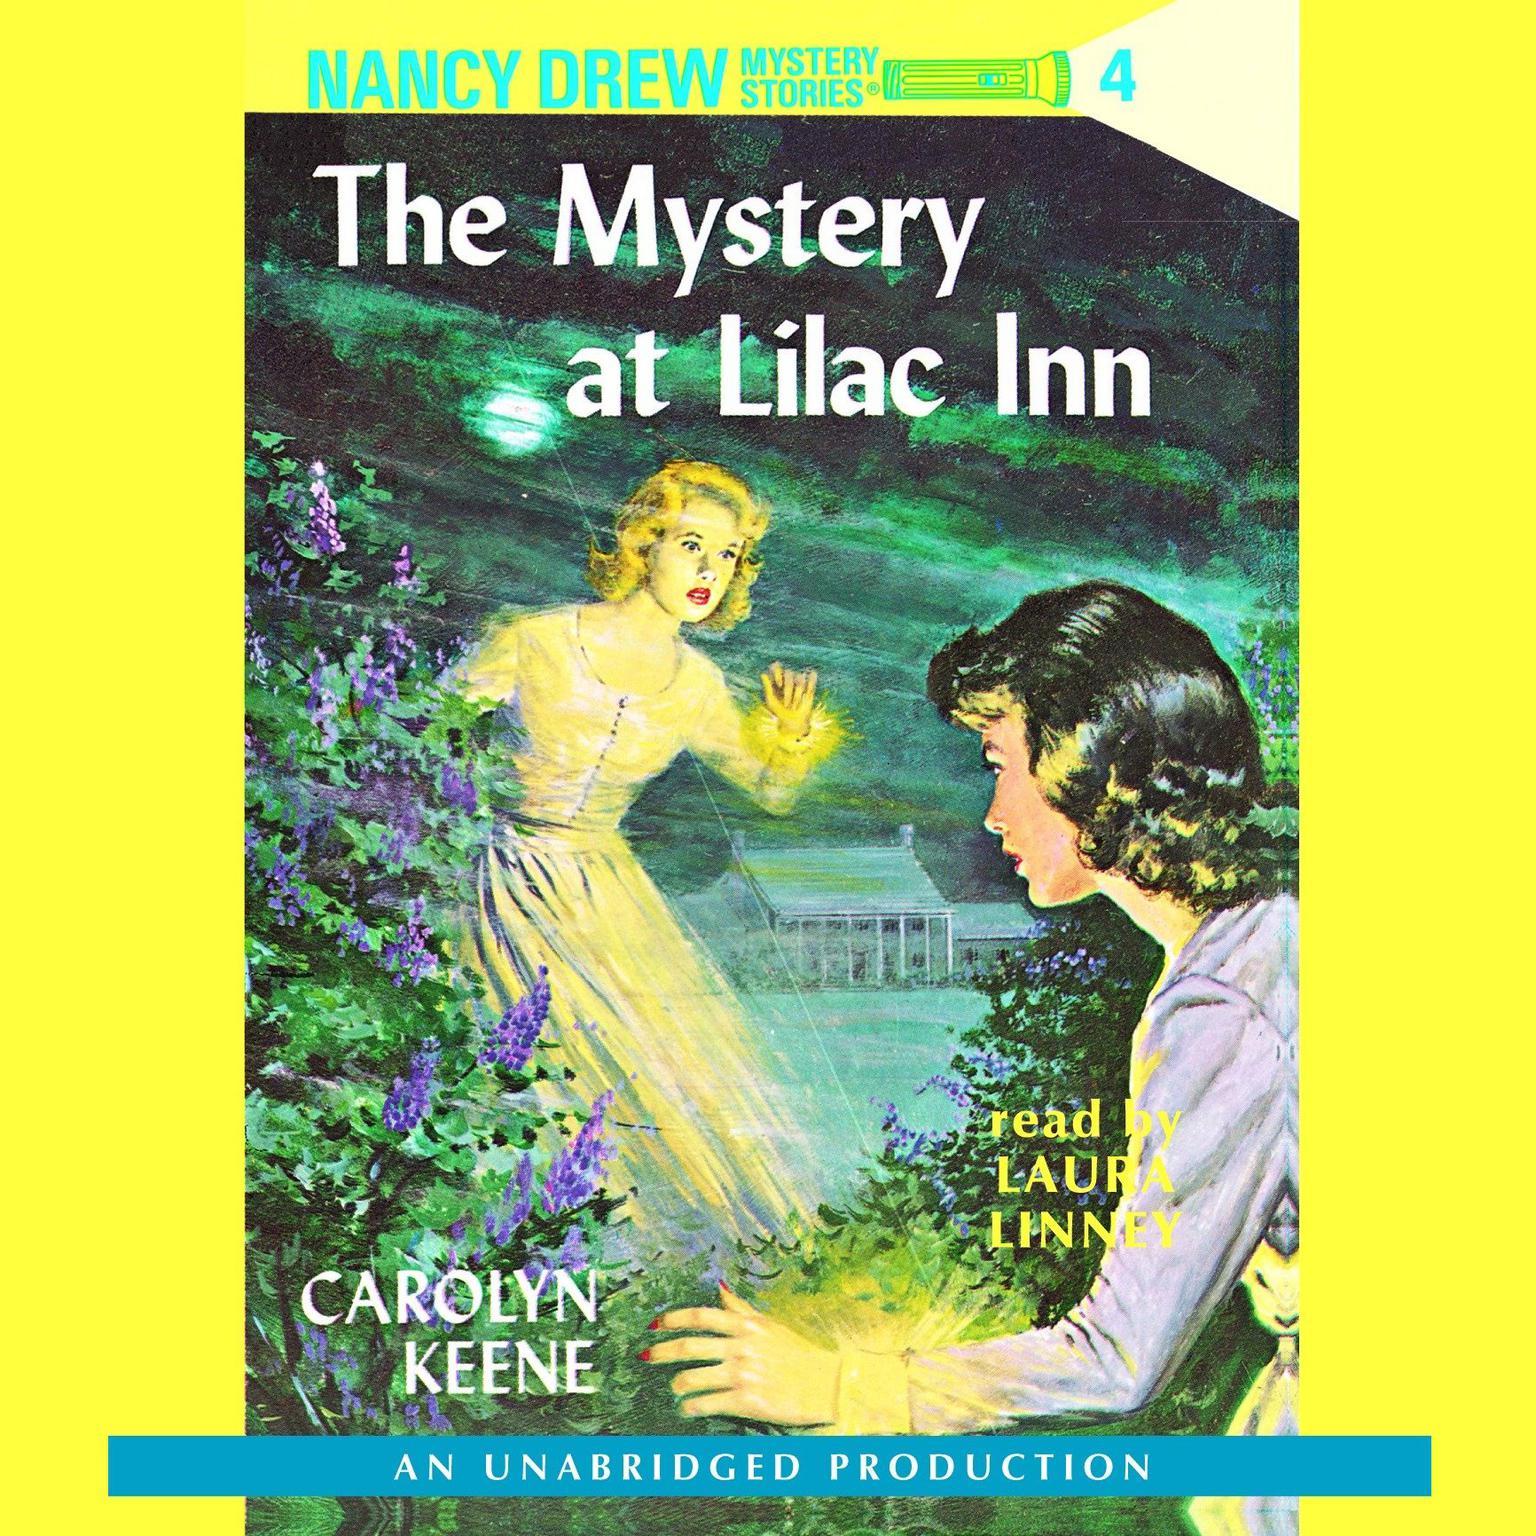 Nancy Drew #4: The Mystery at Lilac Inn Audiobook, by Carolyn Keene